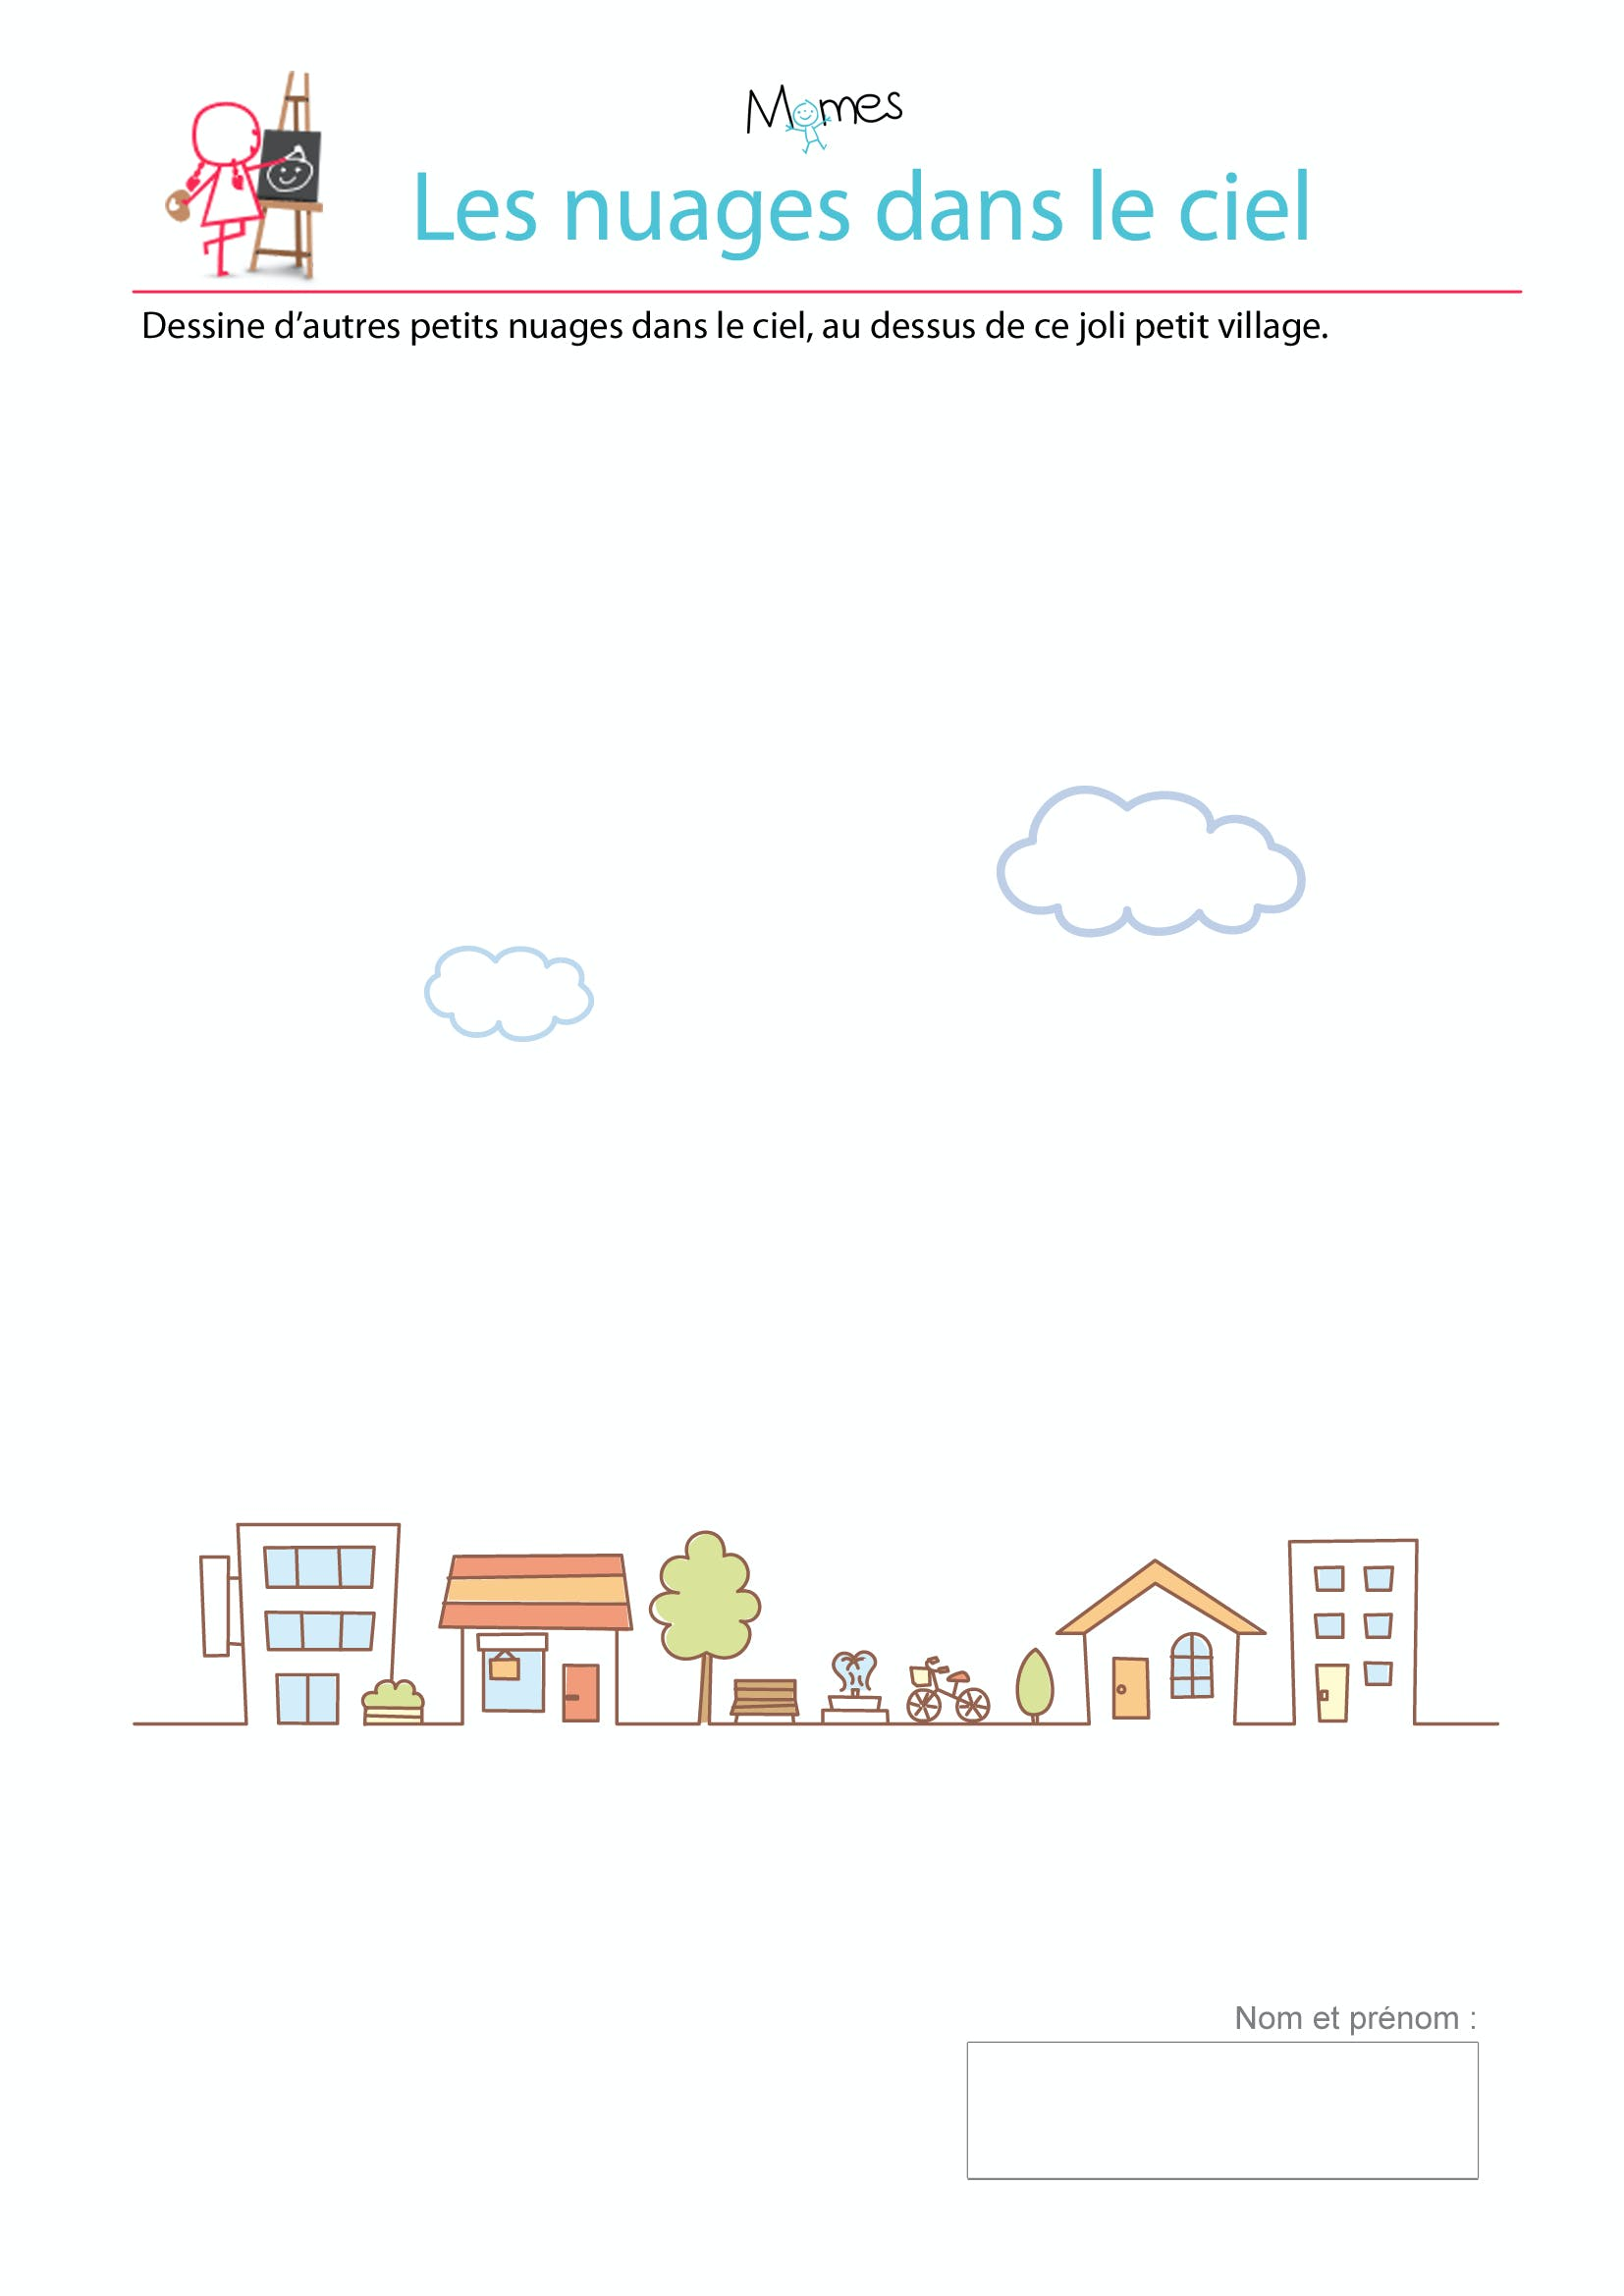 exercice dessin nuage